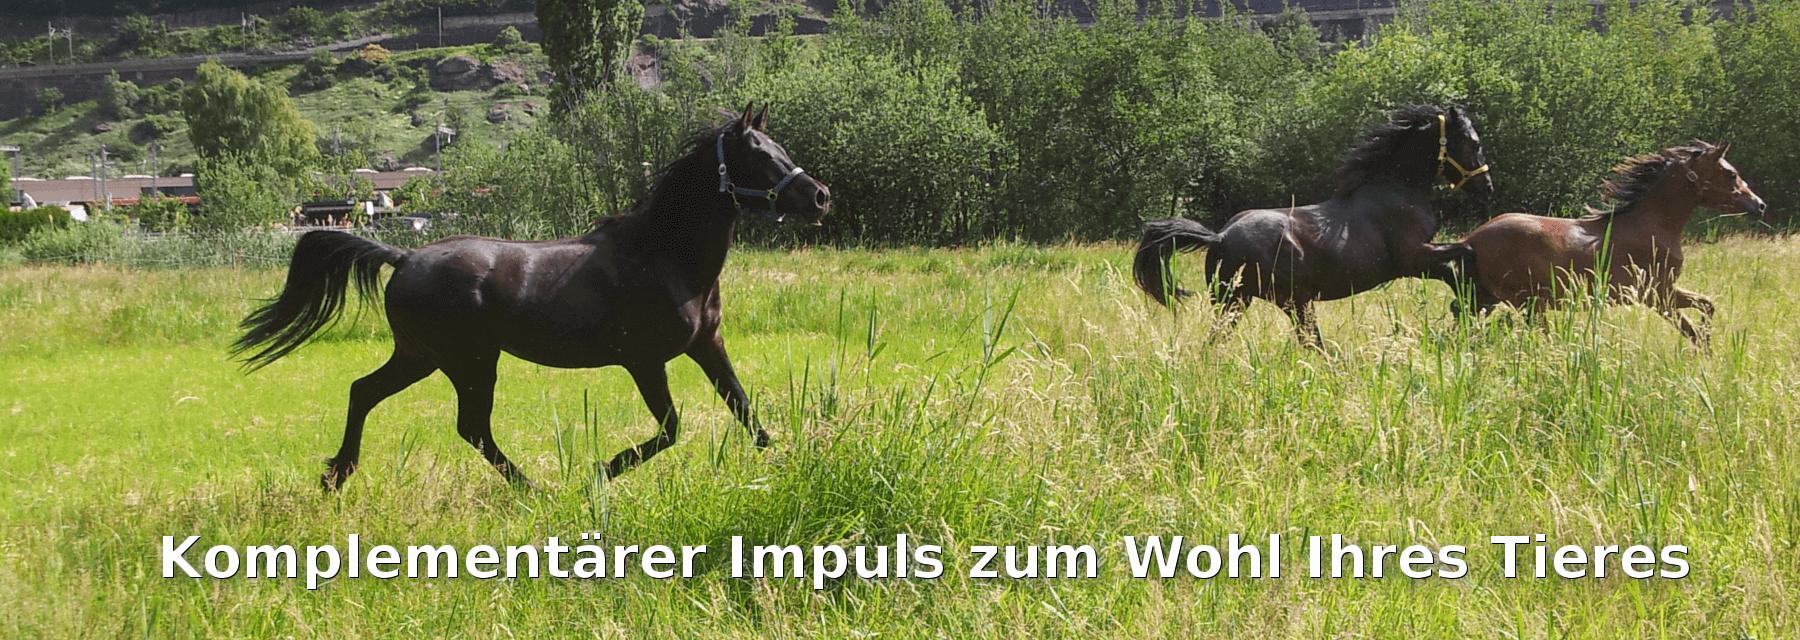 Animal Impuls